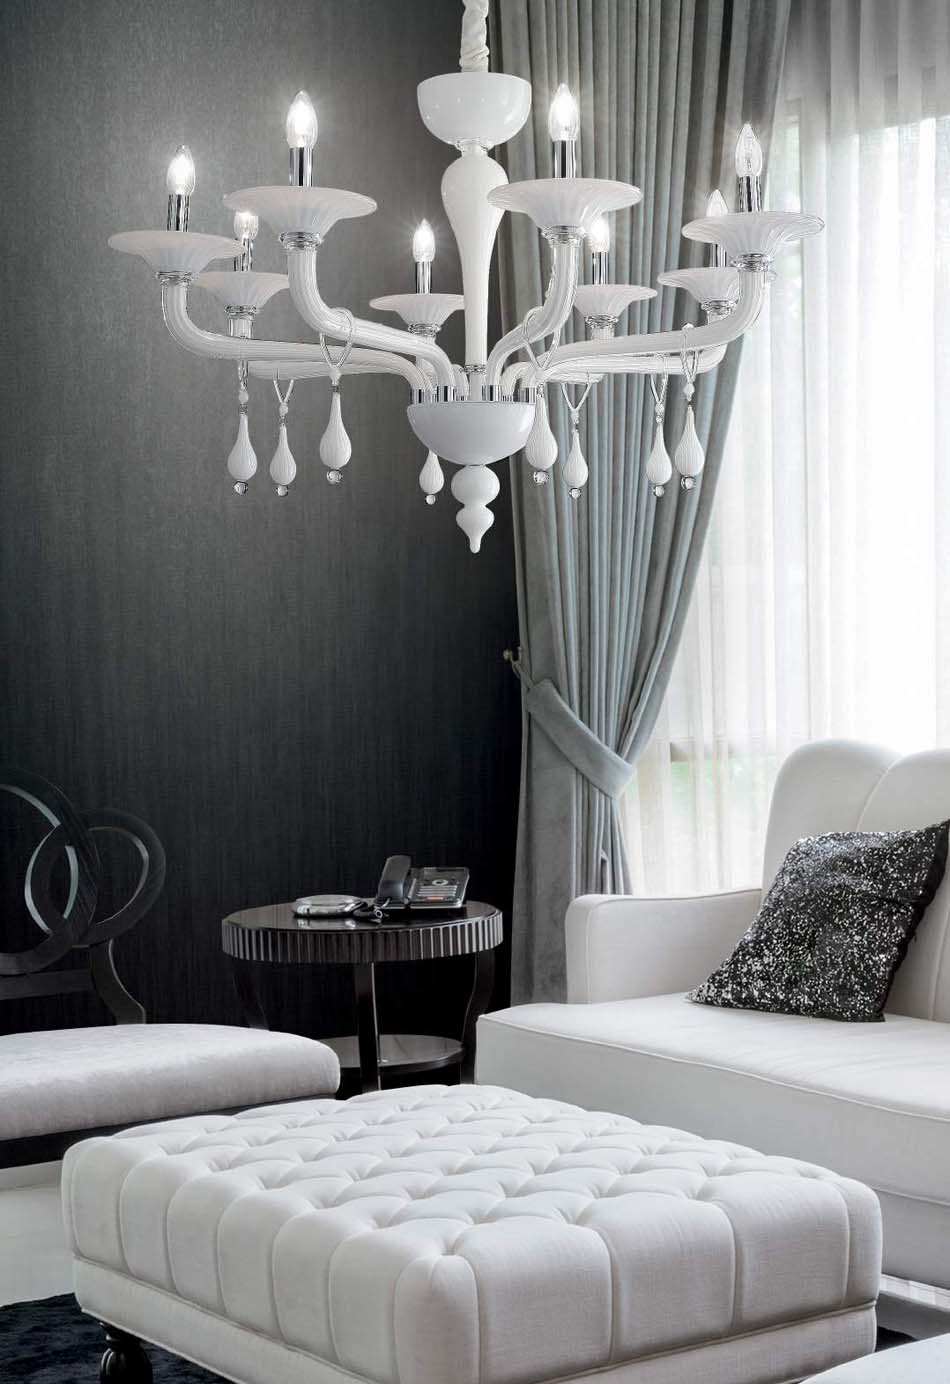 Lampade 30 sospensione Classico Ideal Lux Miramare – Bruni Arredamenti